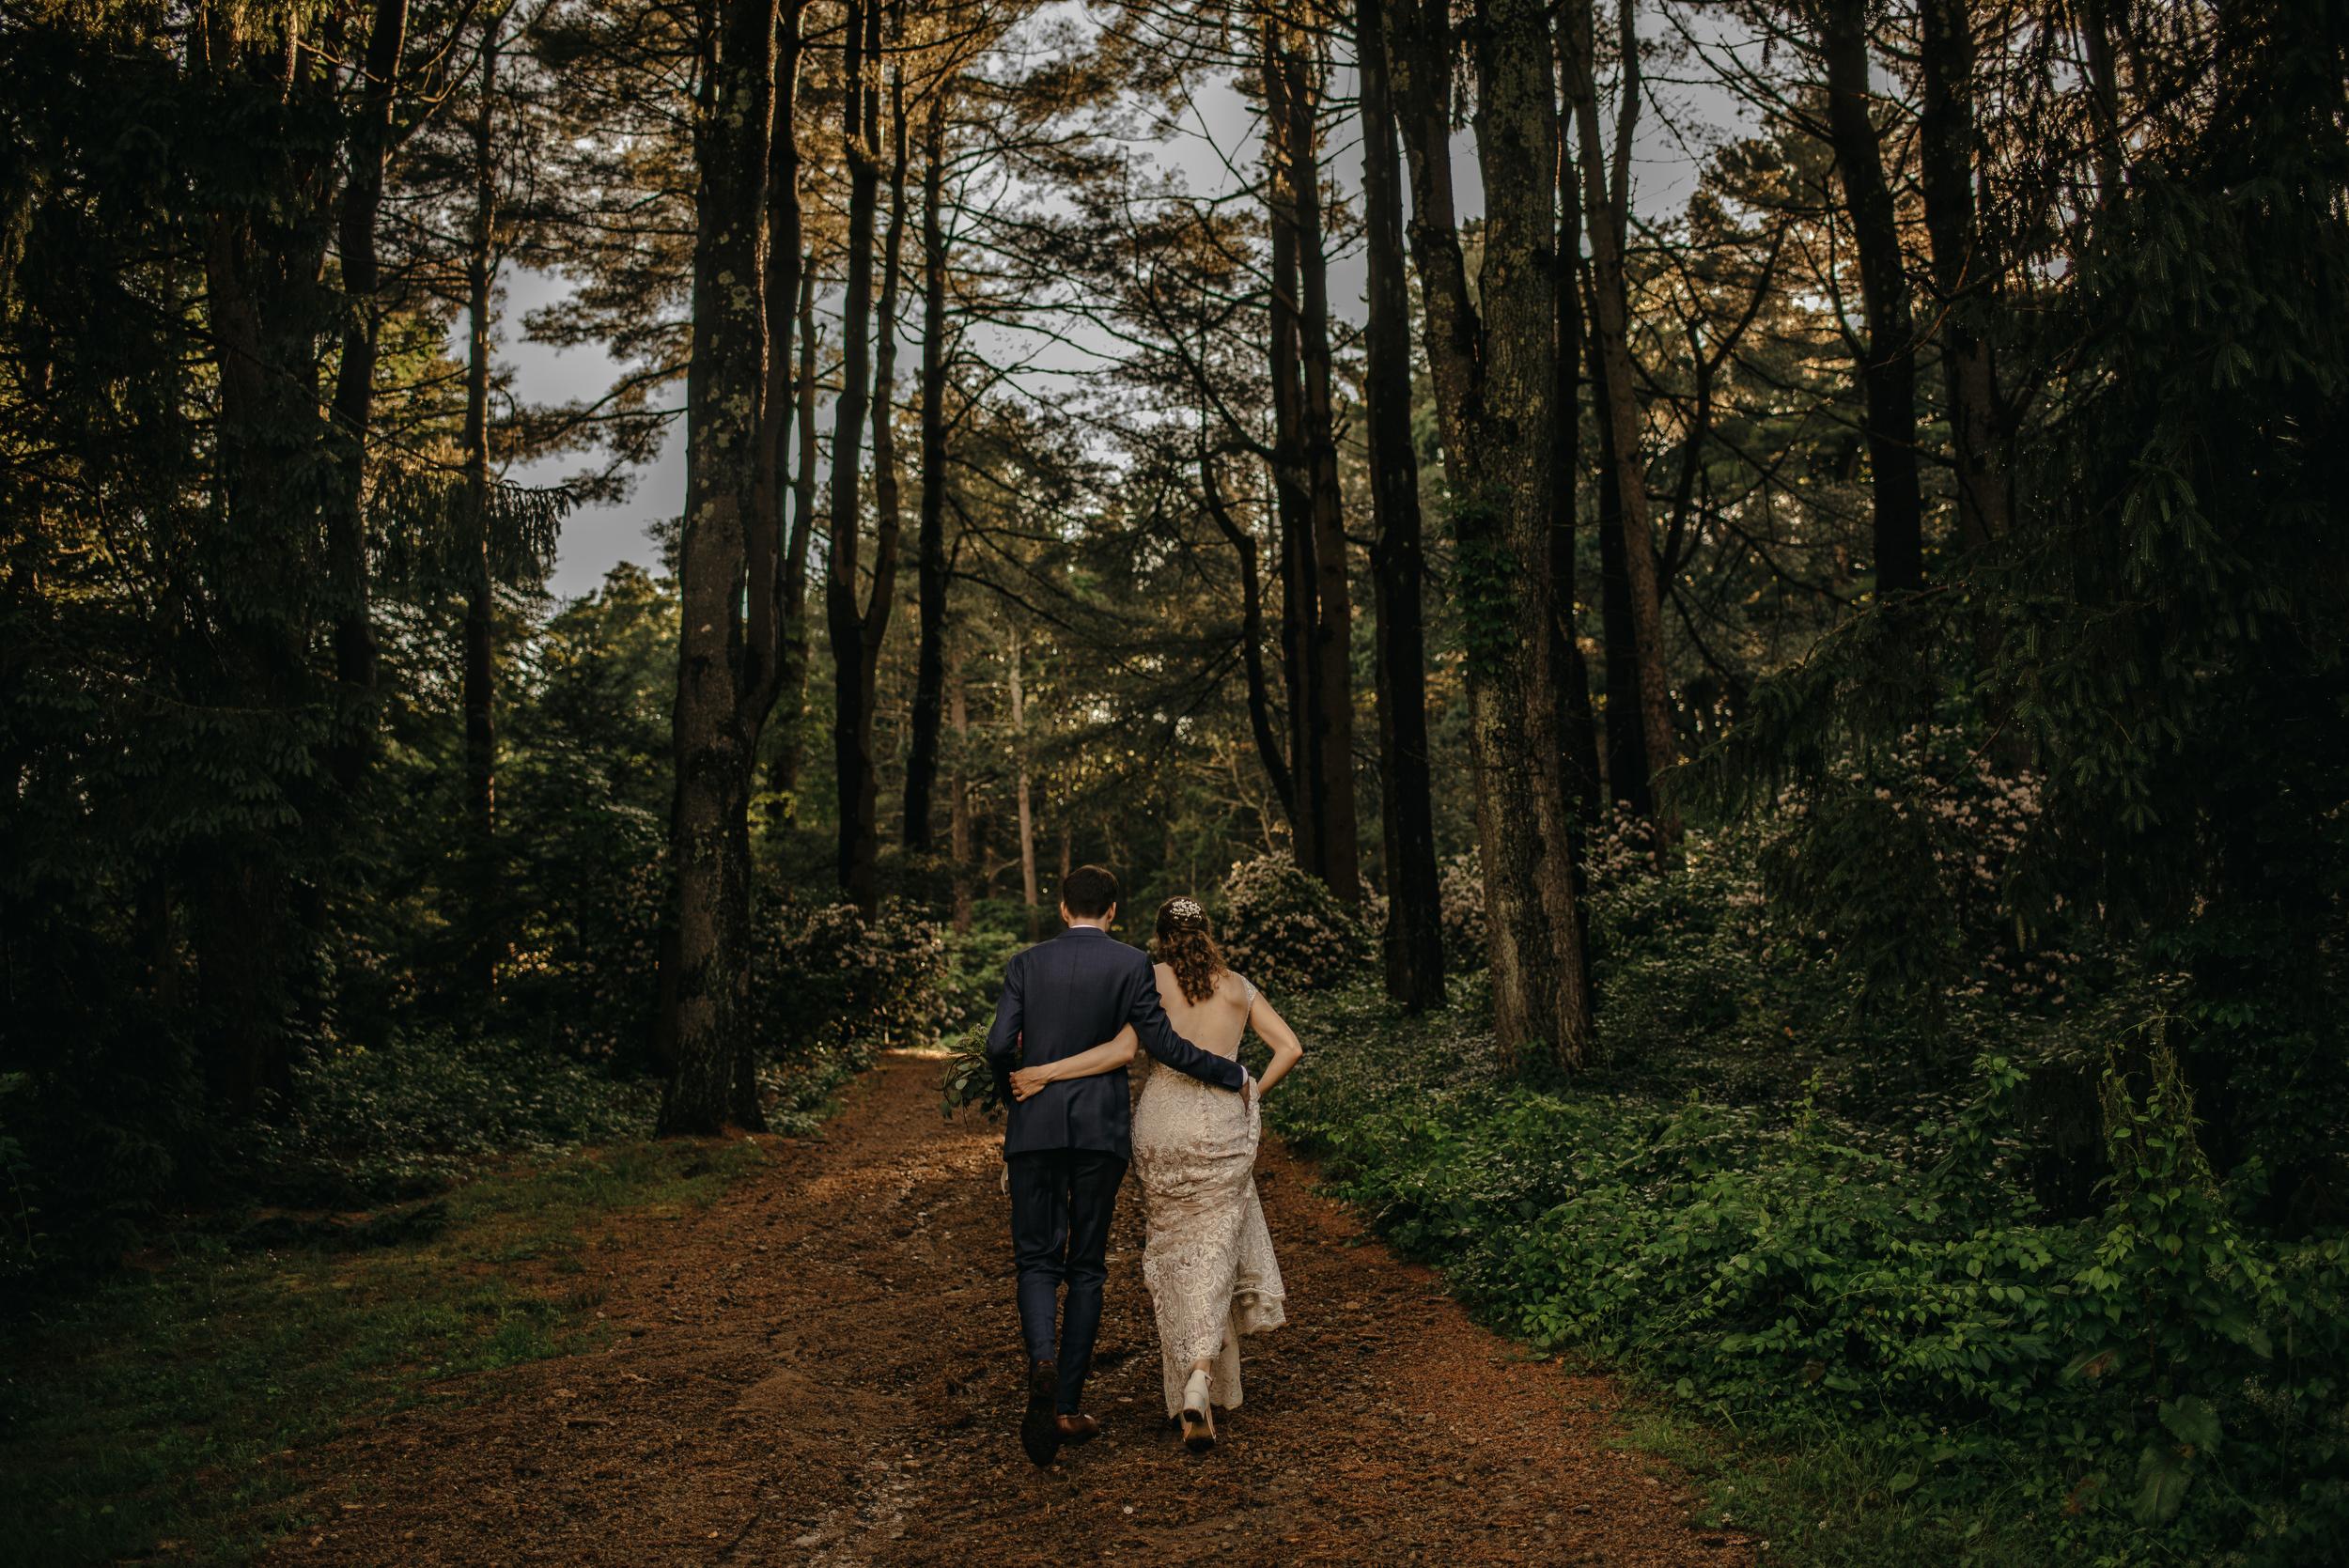 dark and moody creative wedding photos at a farm in new england